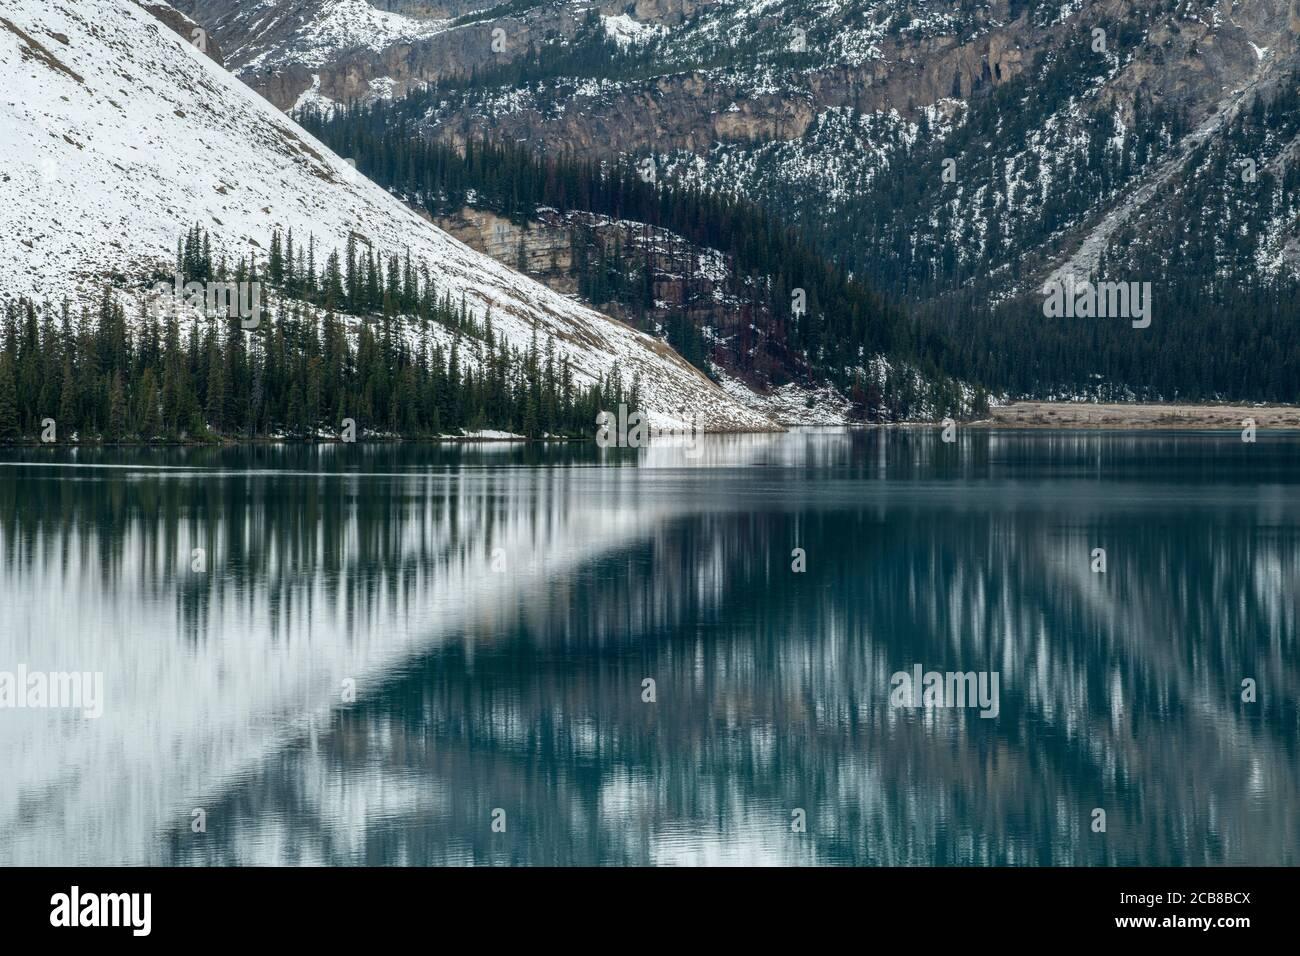 Neve fresca sulla Bow Mountain riflessa in Bow Lake, Banff National Park, Alberta, Canada Foto Stock